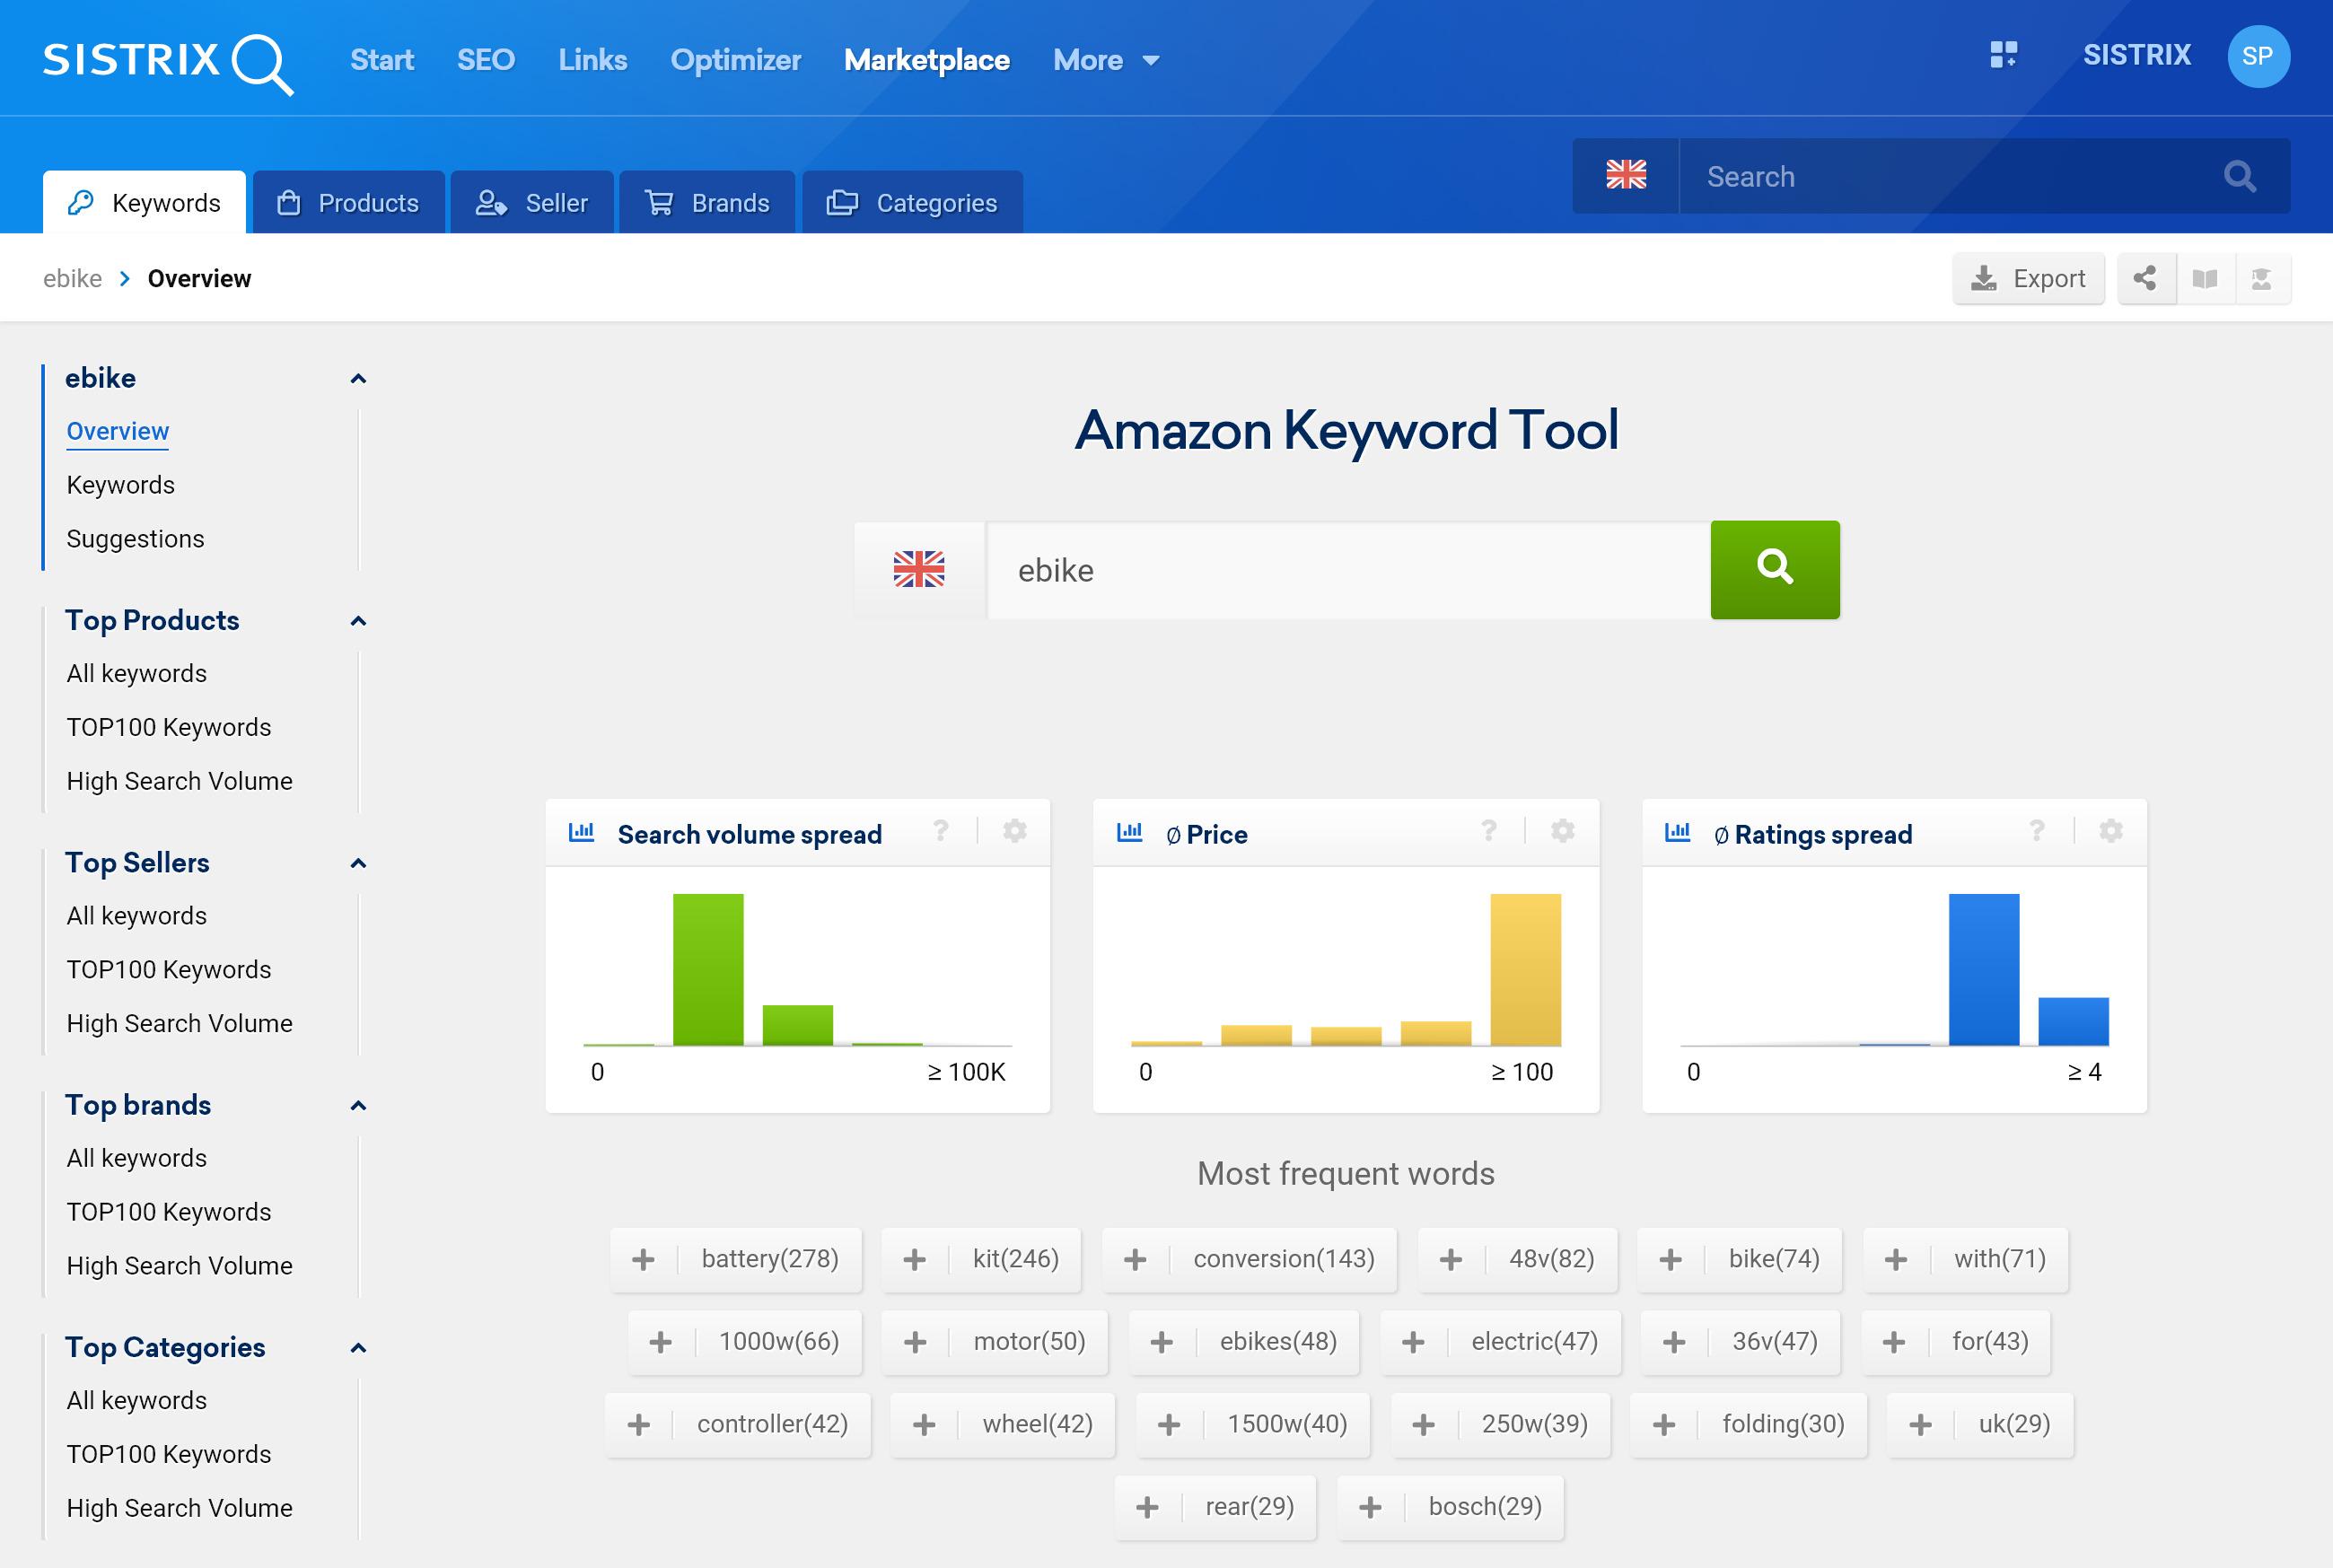 Amazon Keyword Tool - Overview